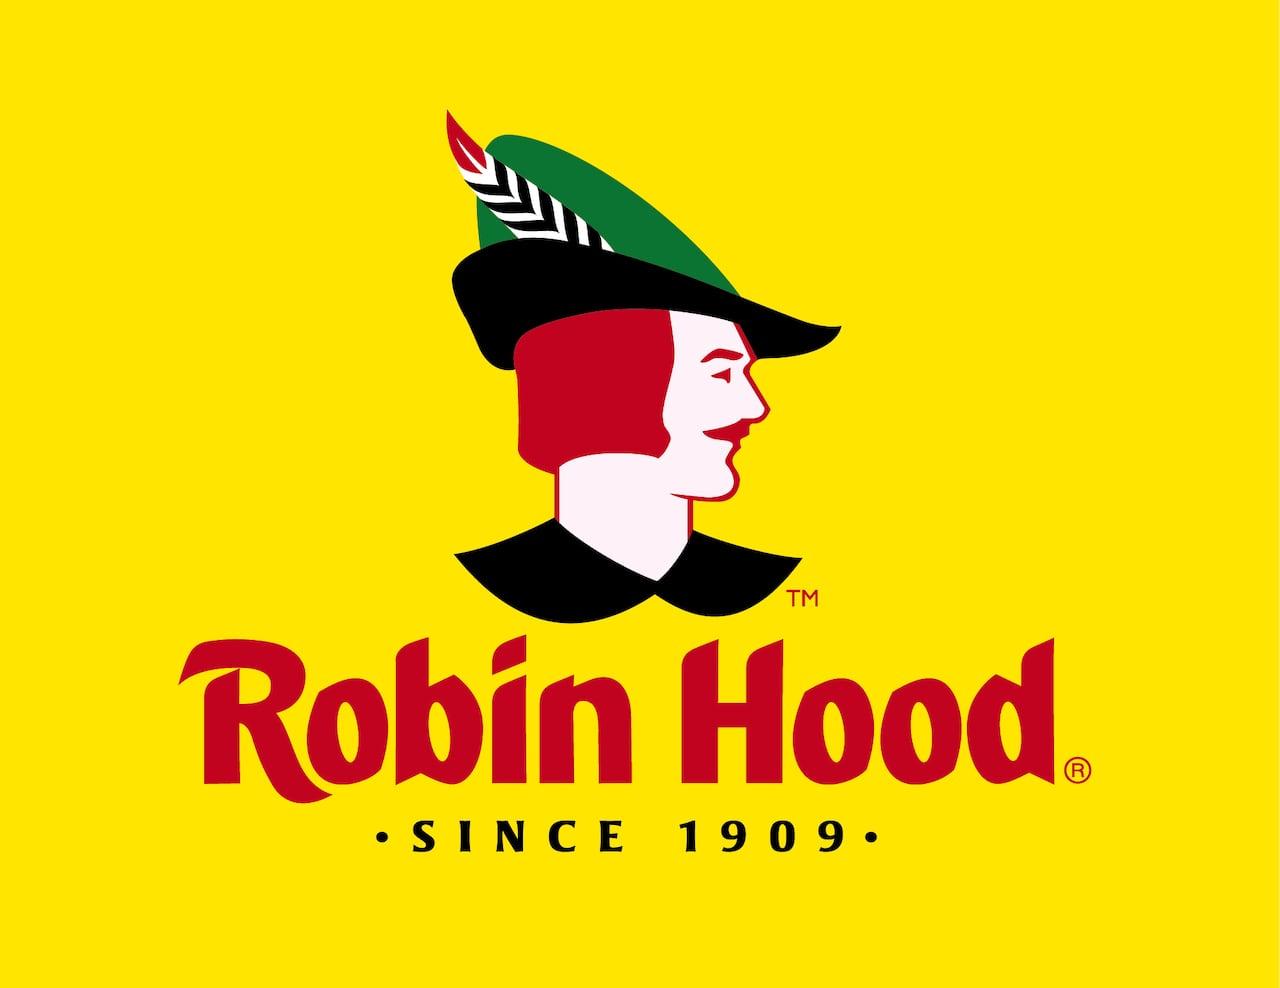 Robin Hood Baking Family